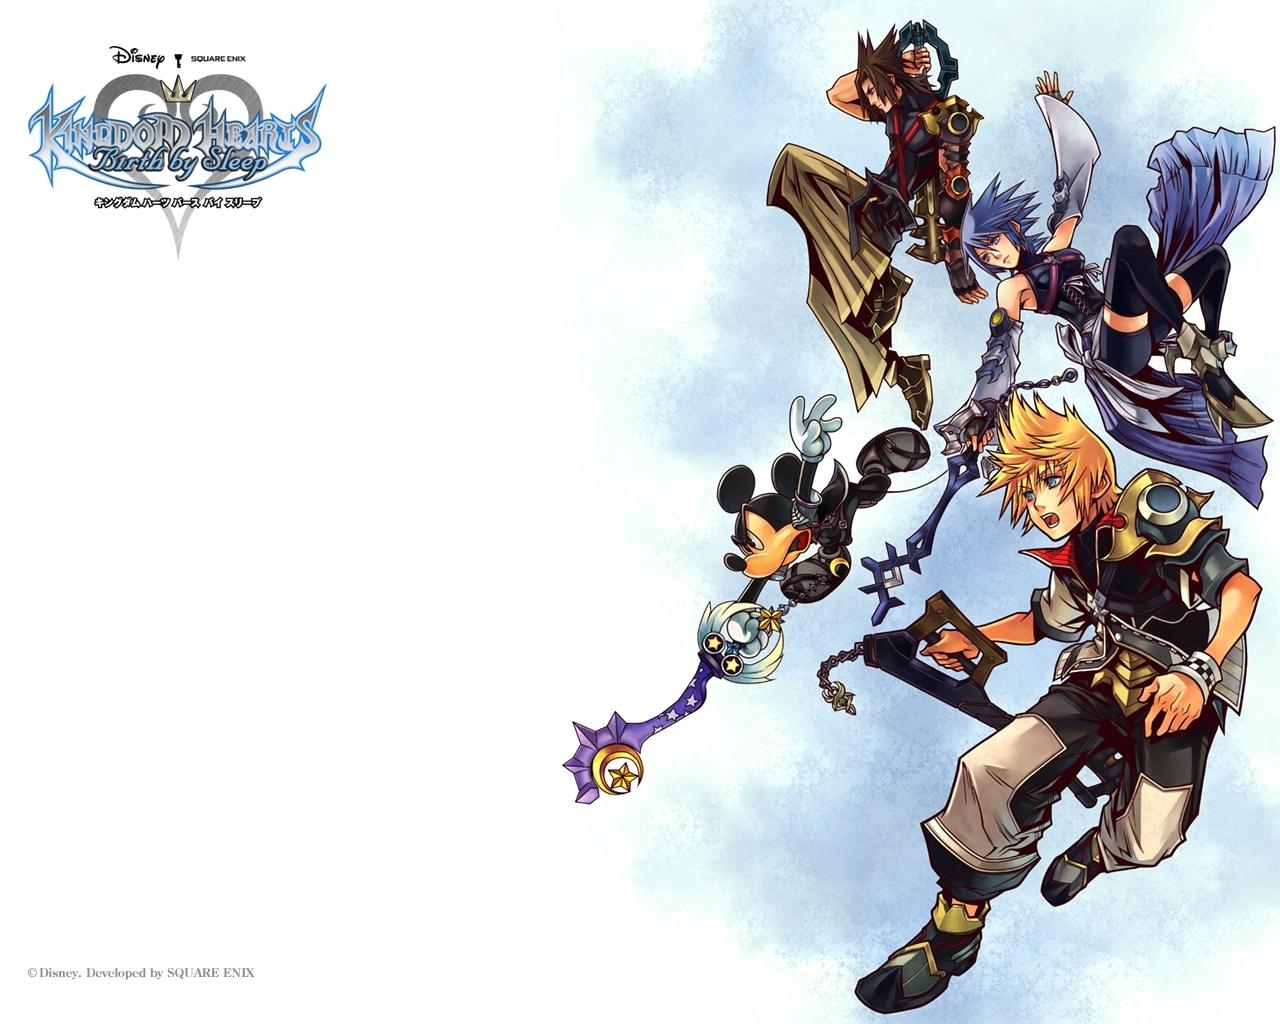 kingdom hearts: birthsleep, wallpaper - zerochan anime image board